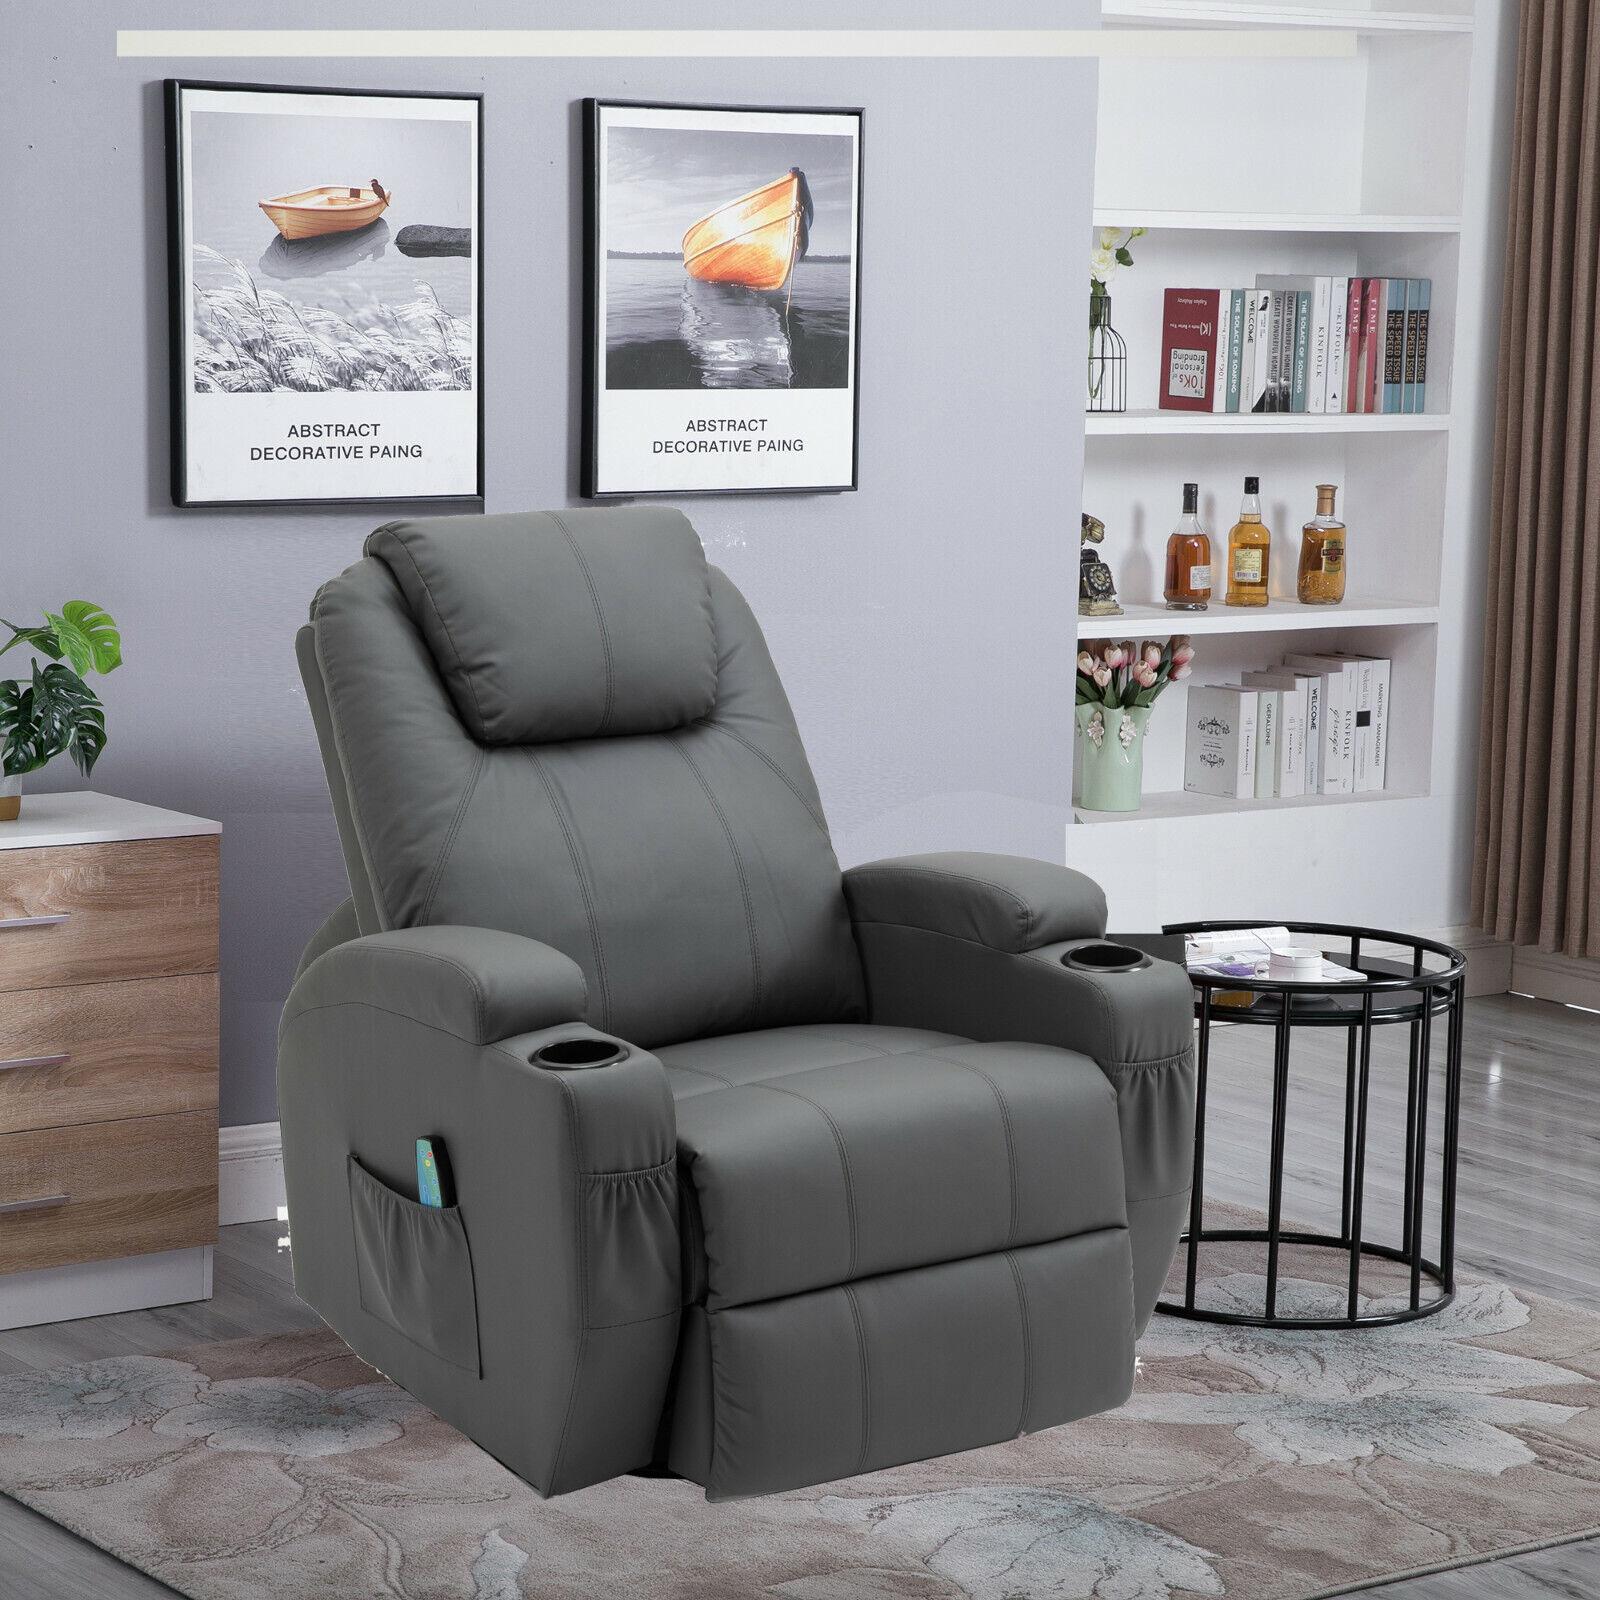 Fernsehsessel Relaxsessel Massagesessel Wärmefunktion Fernbedienung 360°drehbar